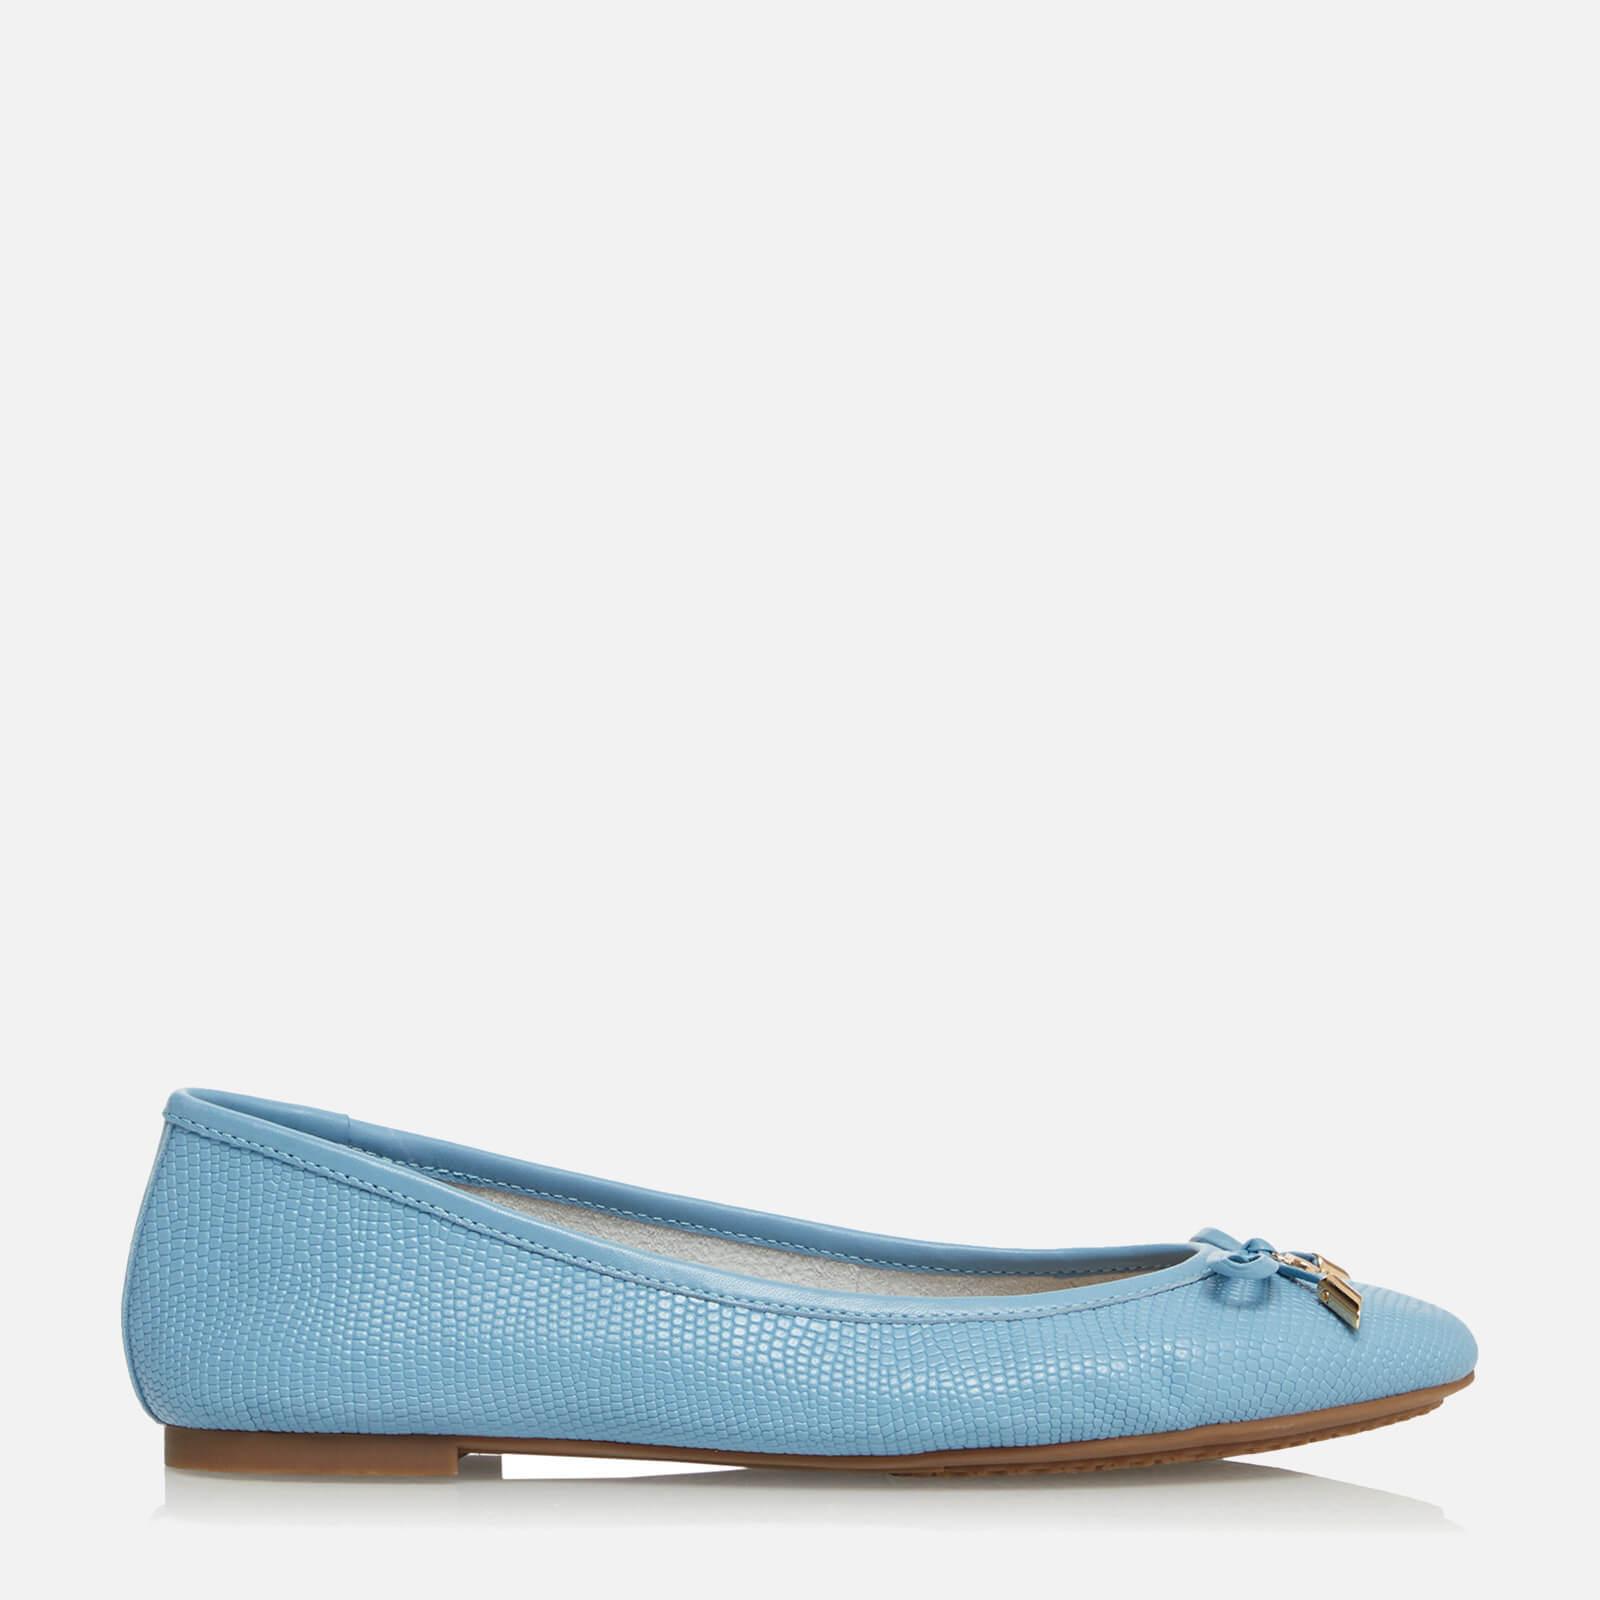 Dune Women's Harpar 2 Leather Ballet Flats - Blue/Leather - UK 8